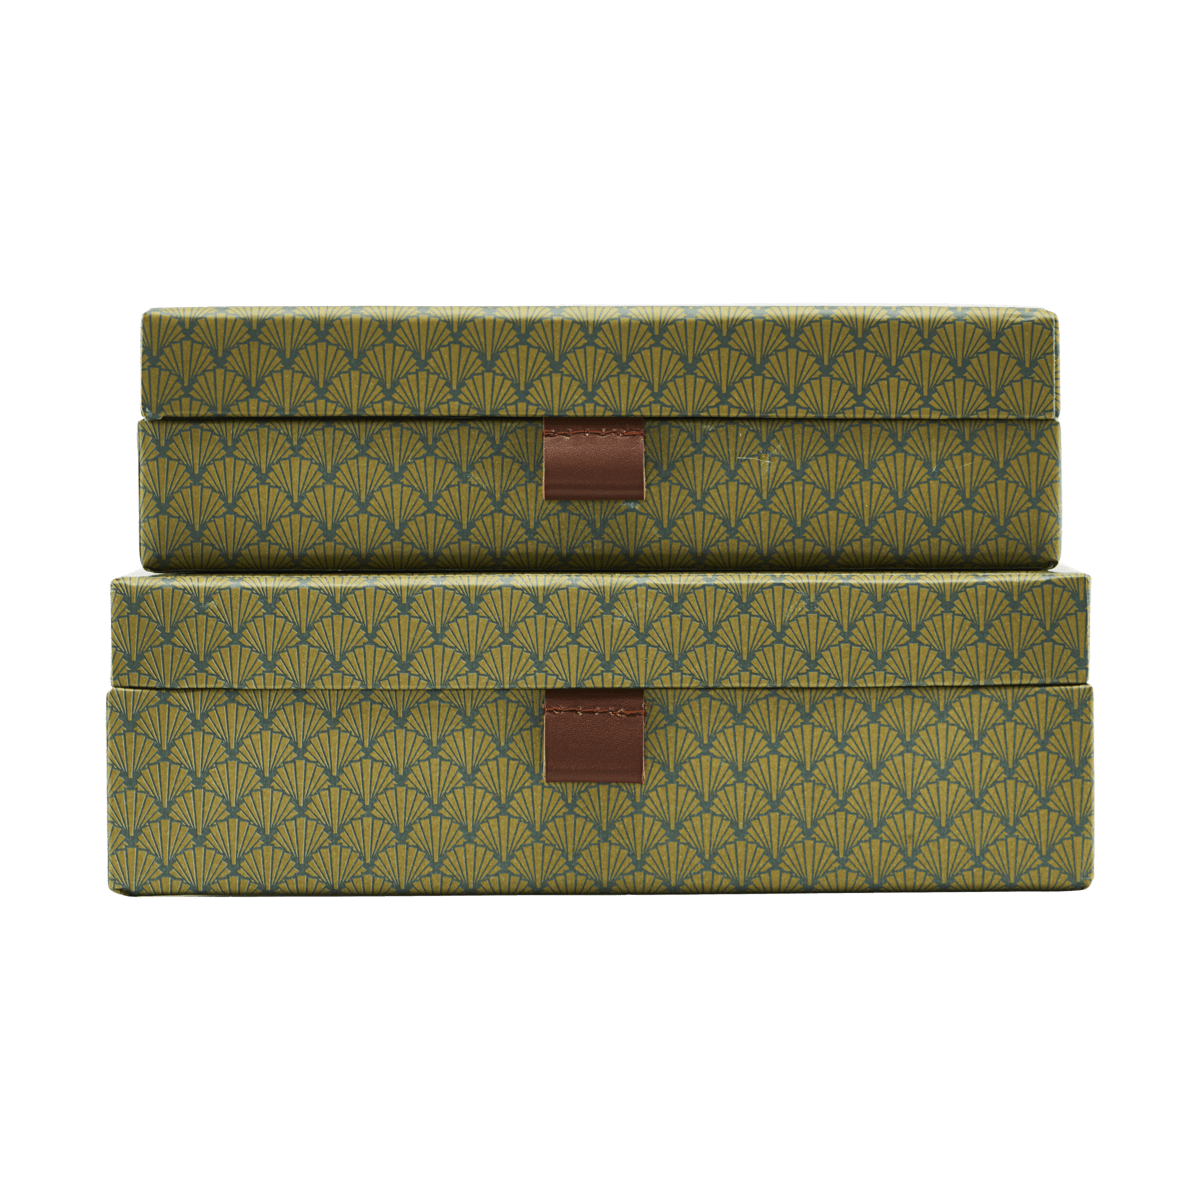 Sada 2 ks − Úložná krabice Fan